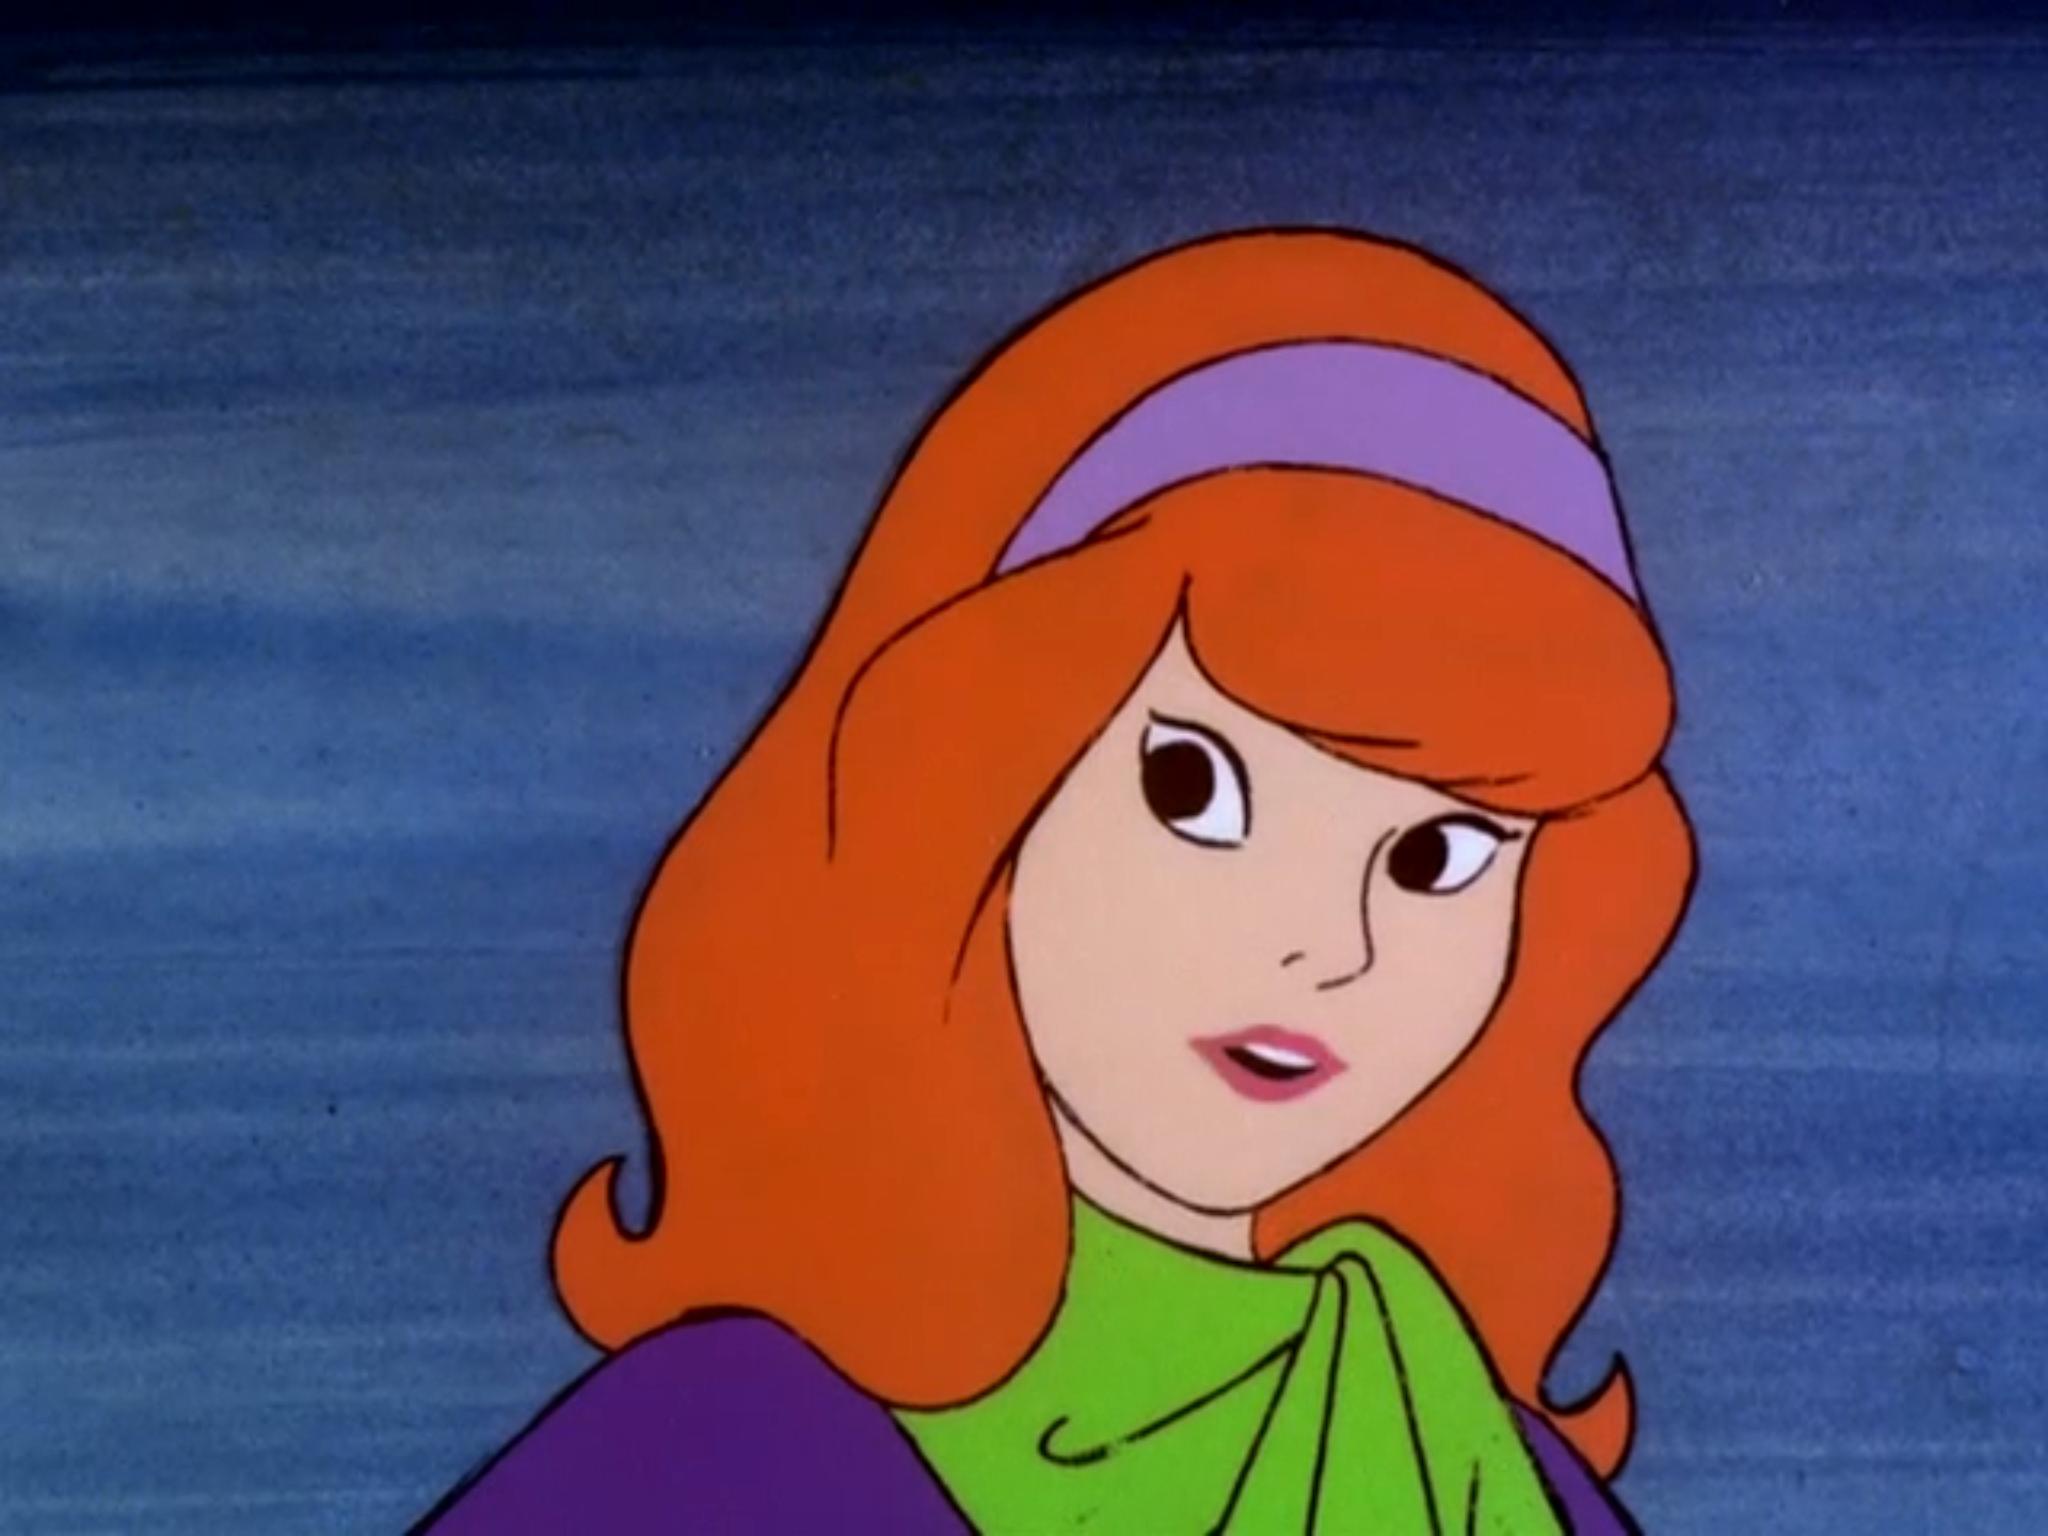 Daphne scooby doo daphne blake pinterest - Daphne scoubidou ...